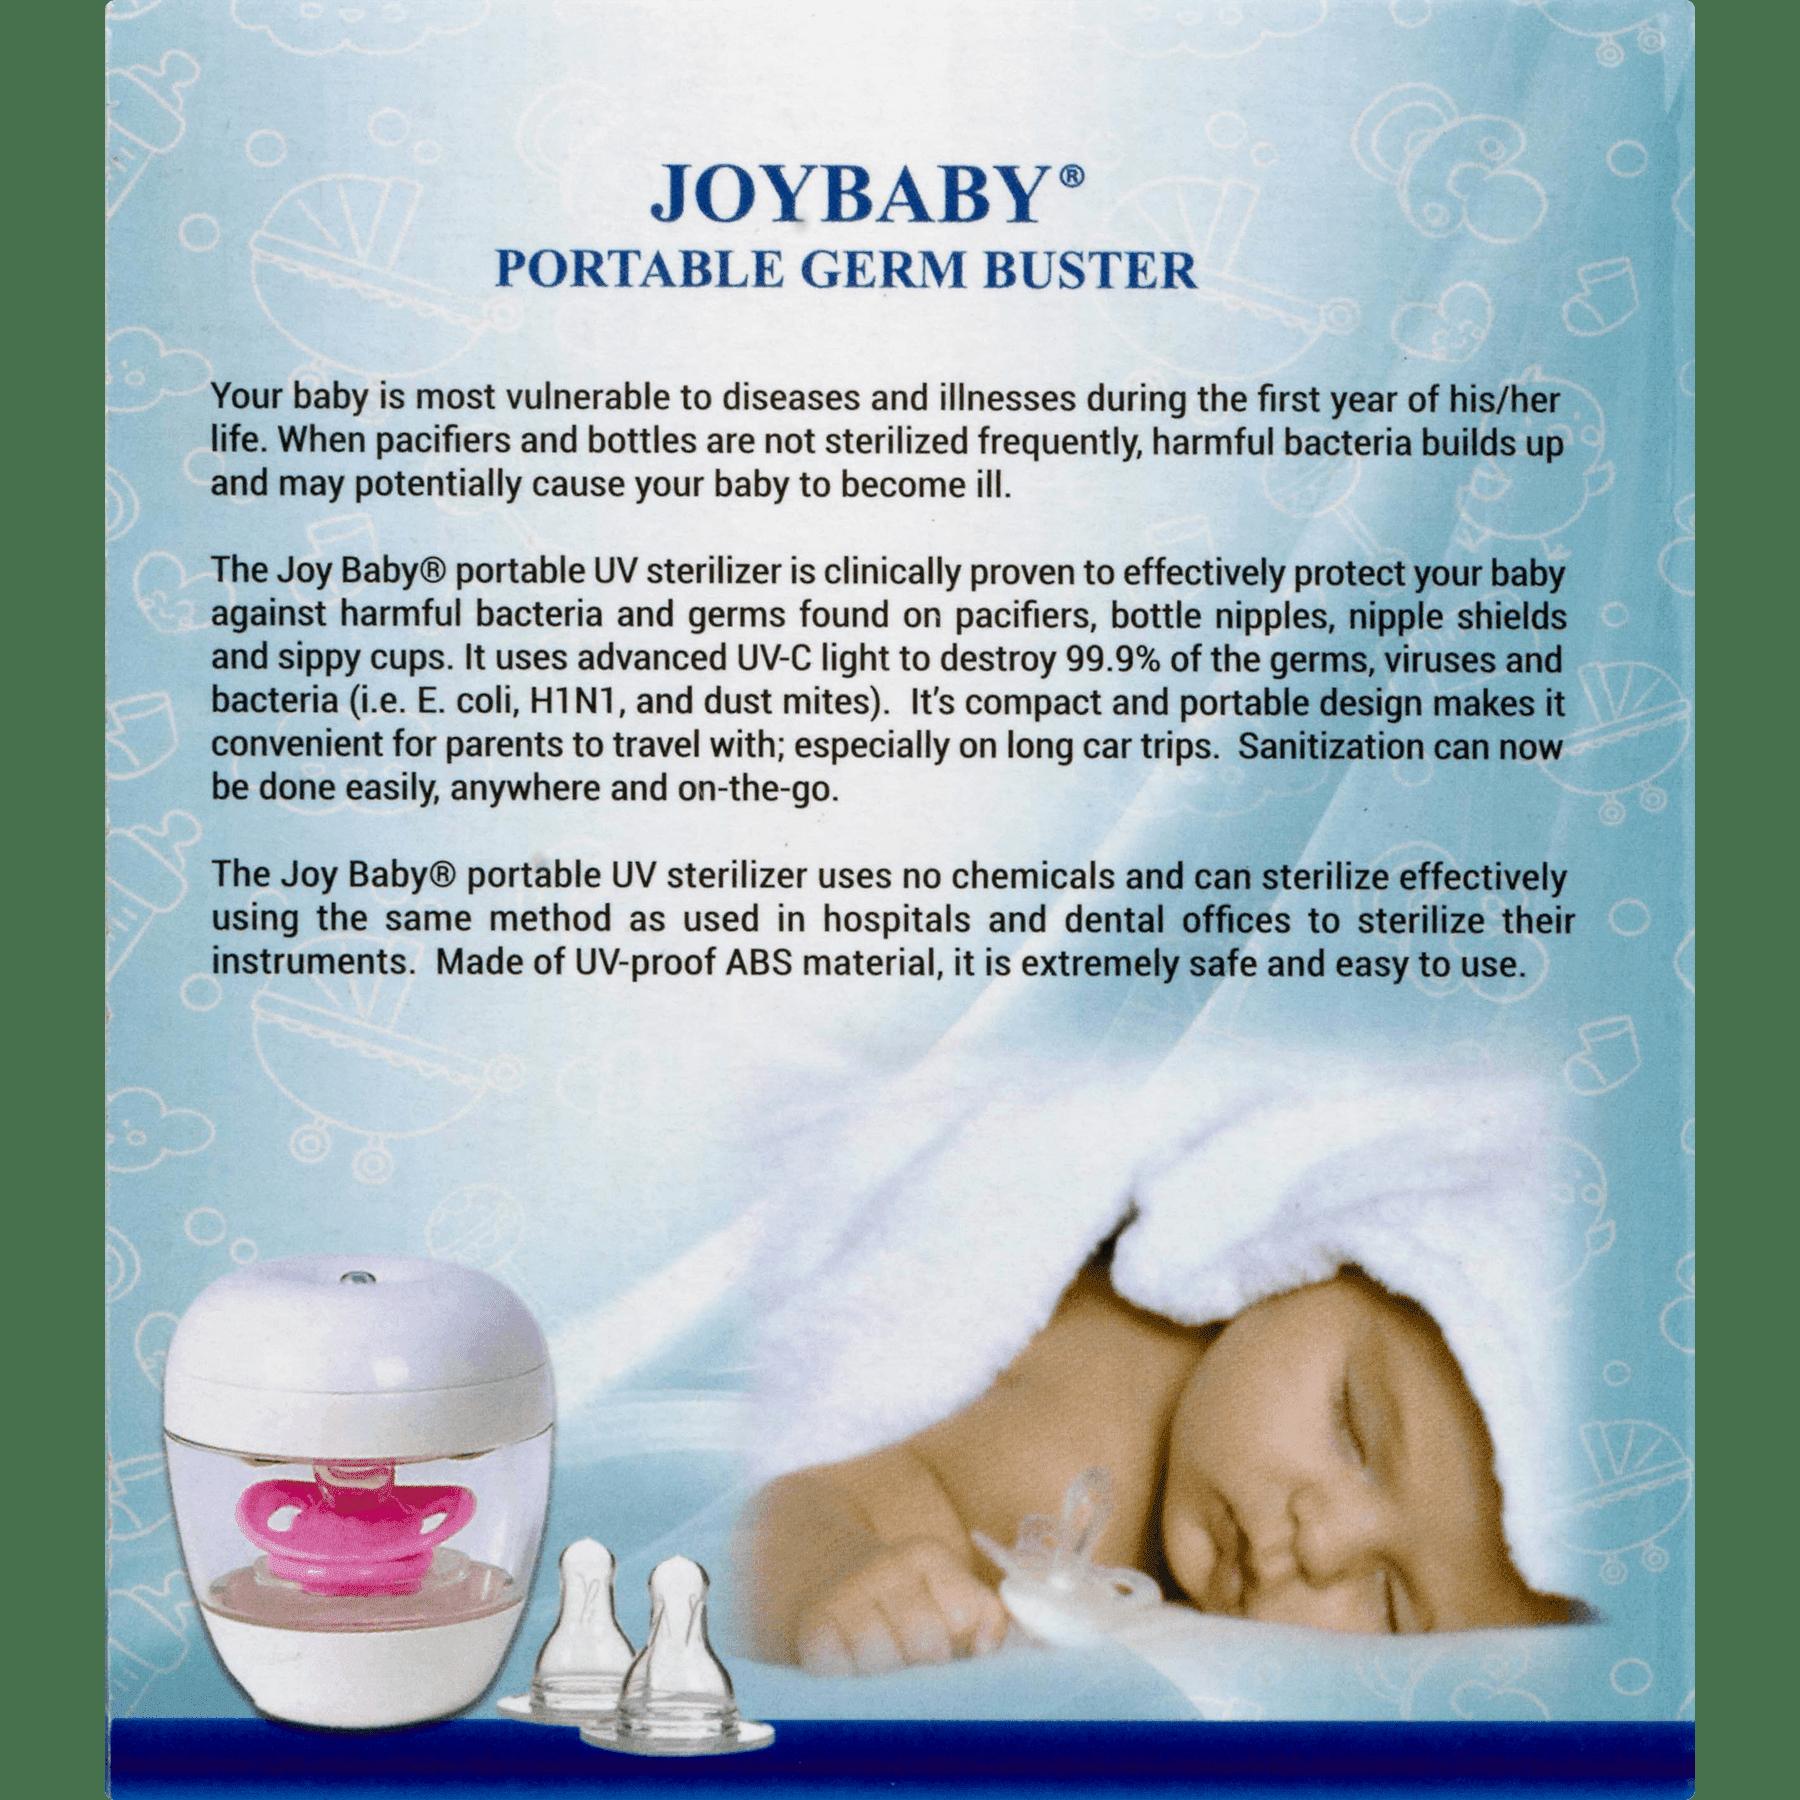 Joy Baby Portable UV Sterilizer, 1.0 CT - Walmart.com